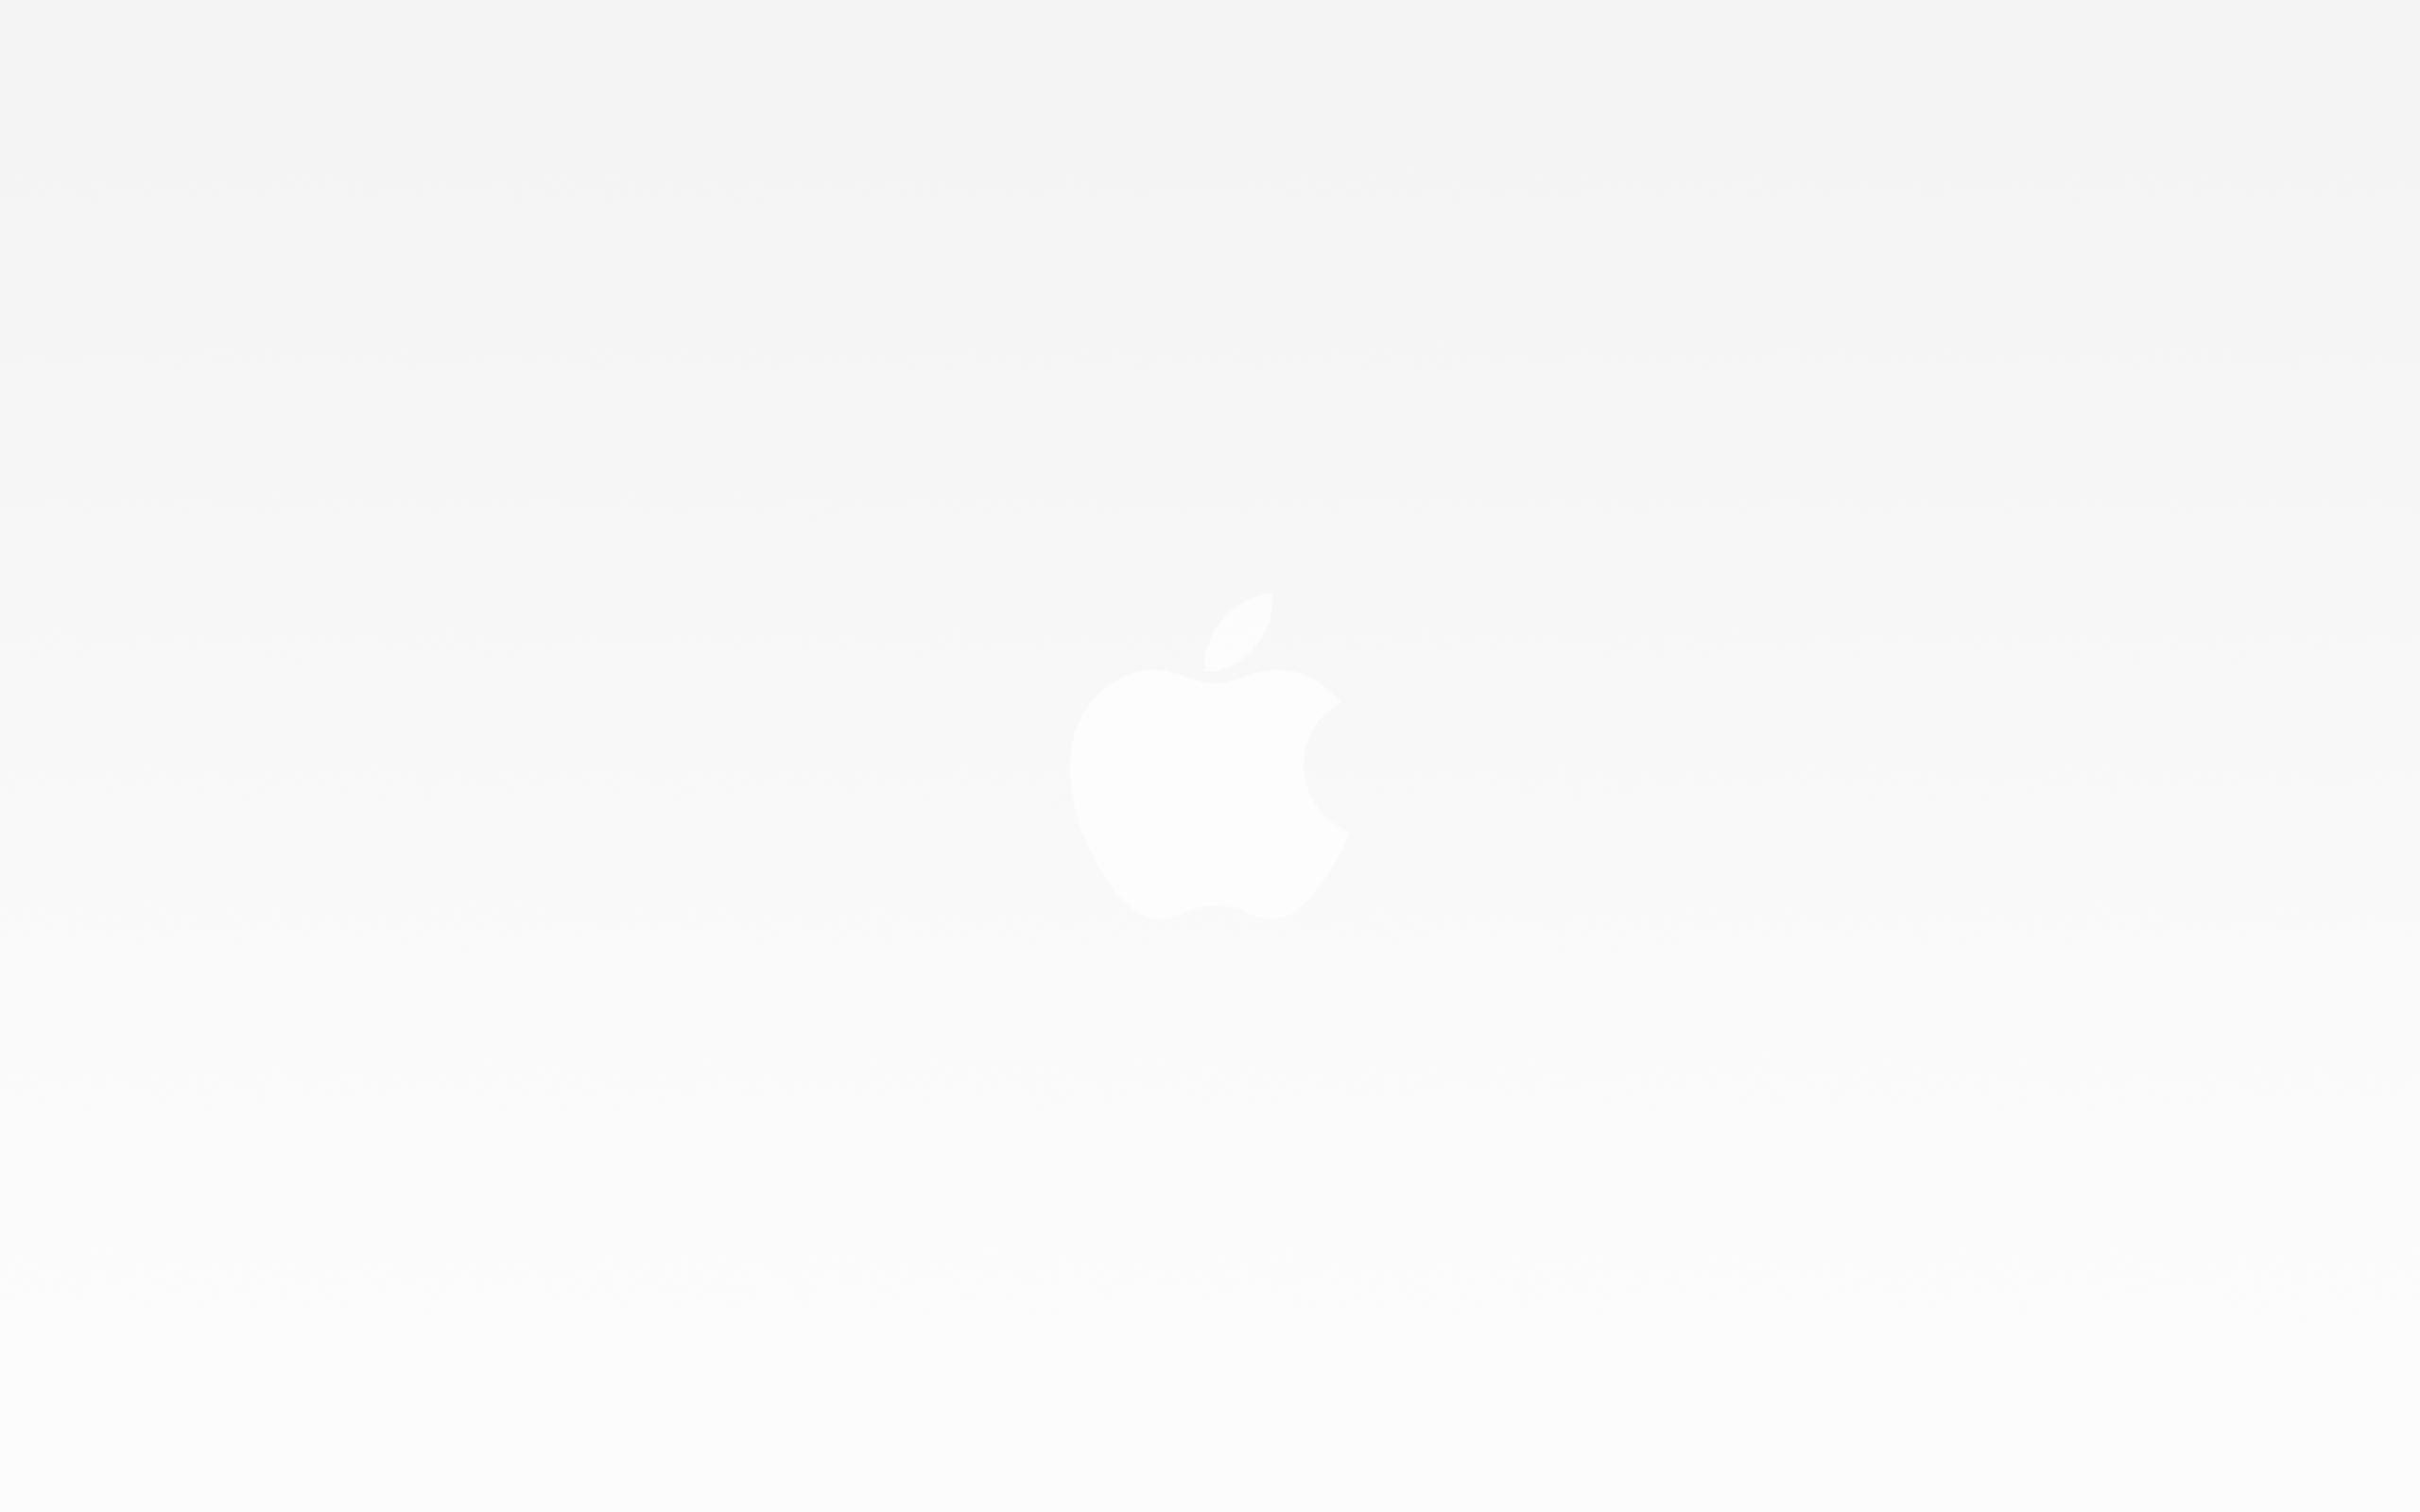 All White Background for Desktop 2560x1600